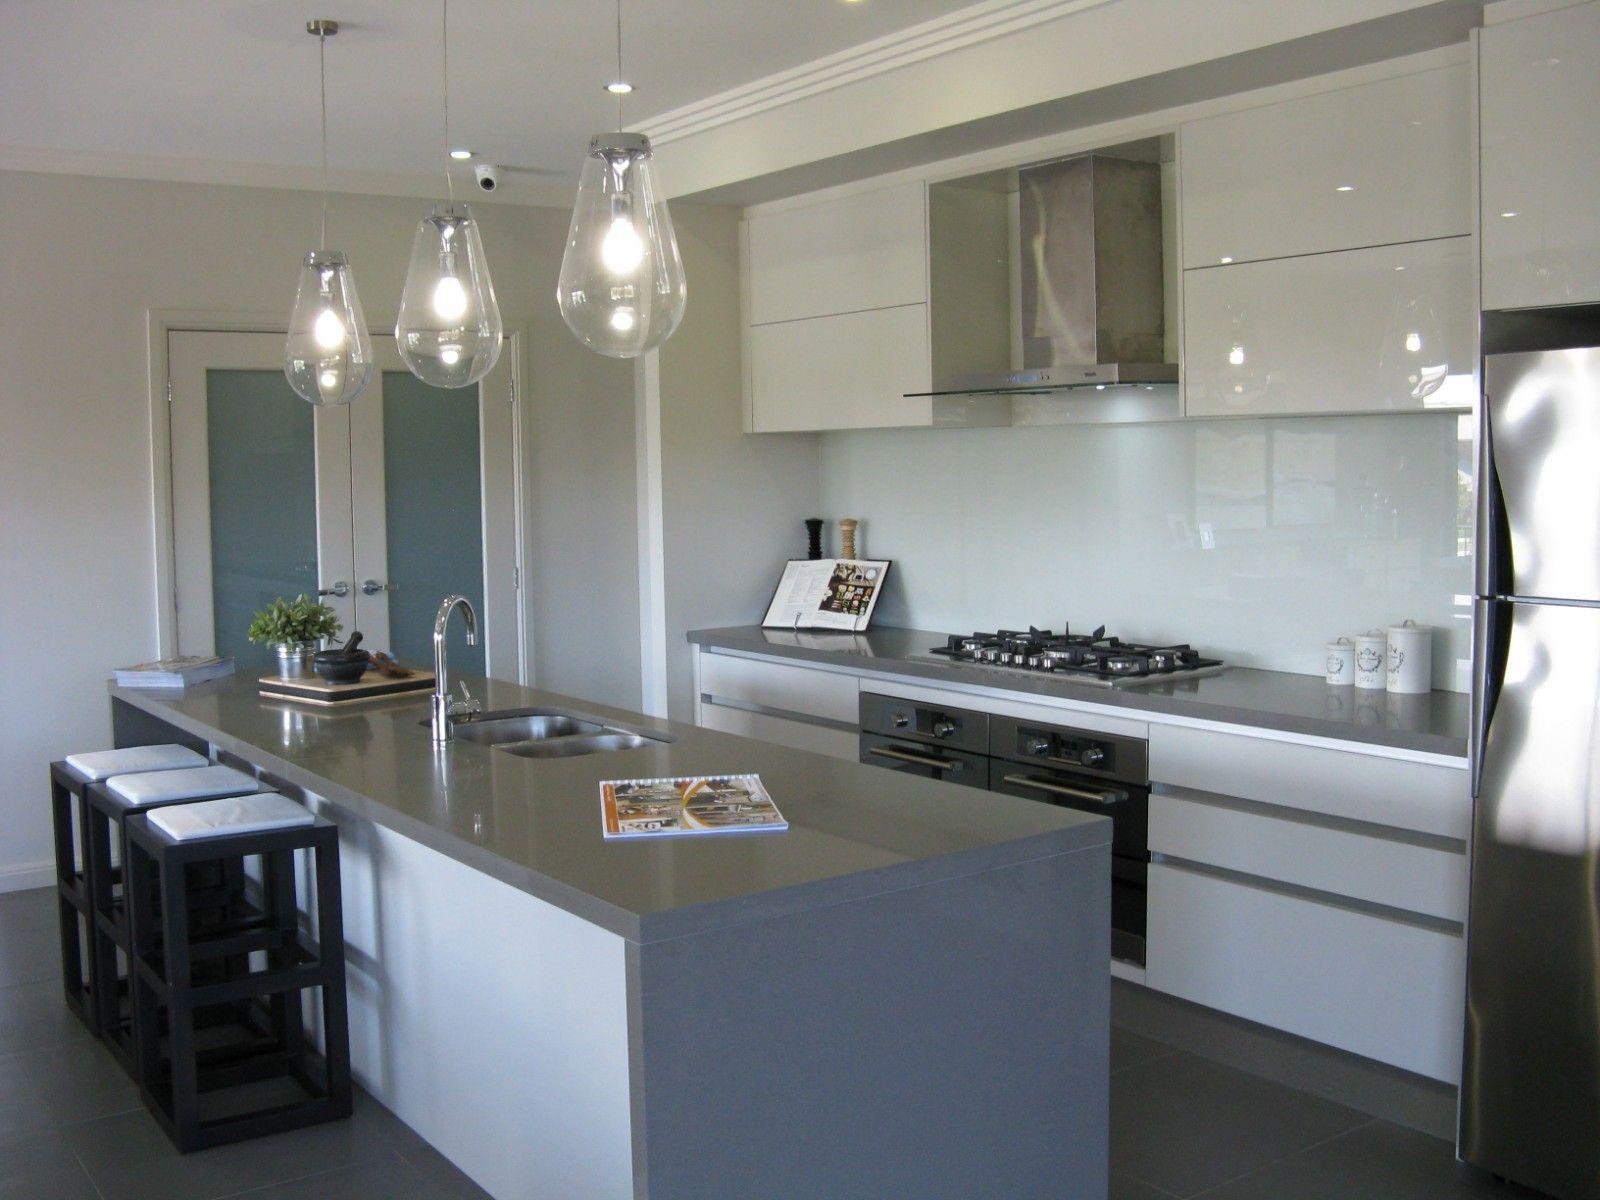 Masterton homes sonata kitchen ingredients for the for Masterton home designs